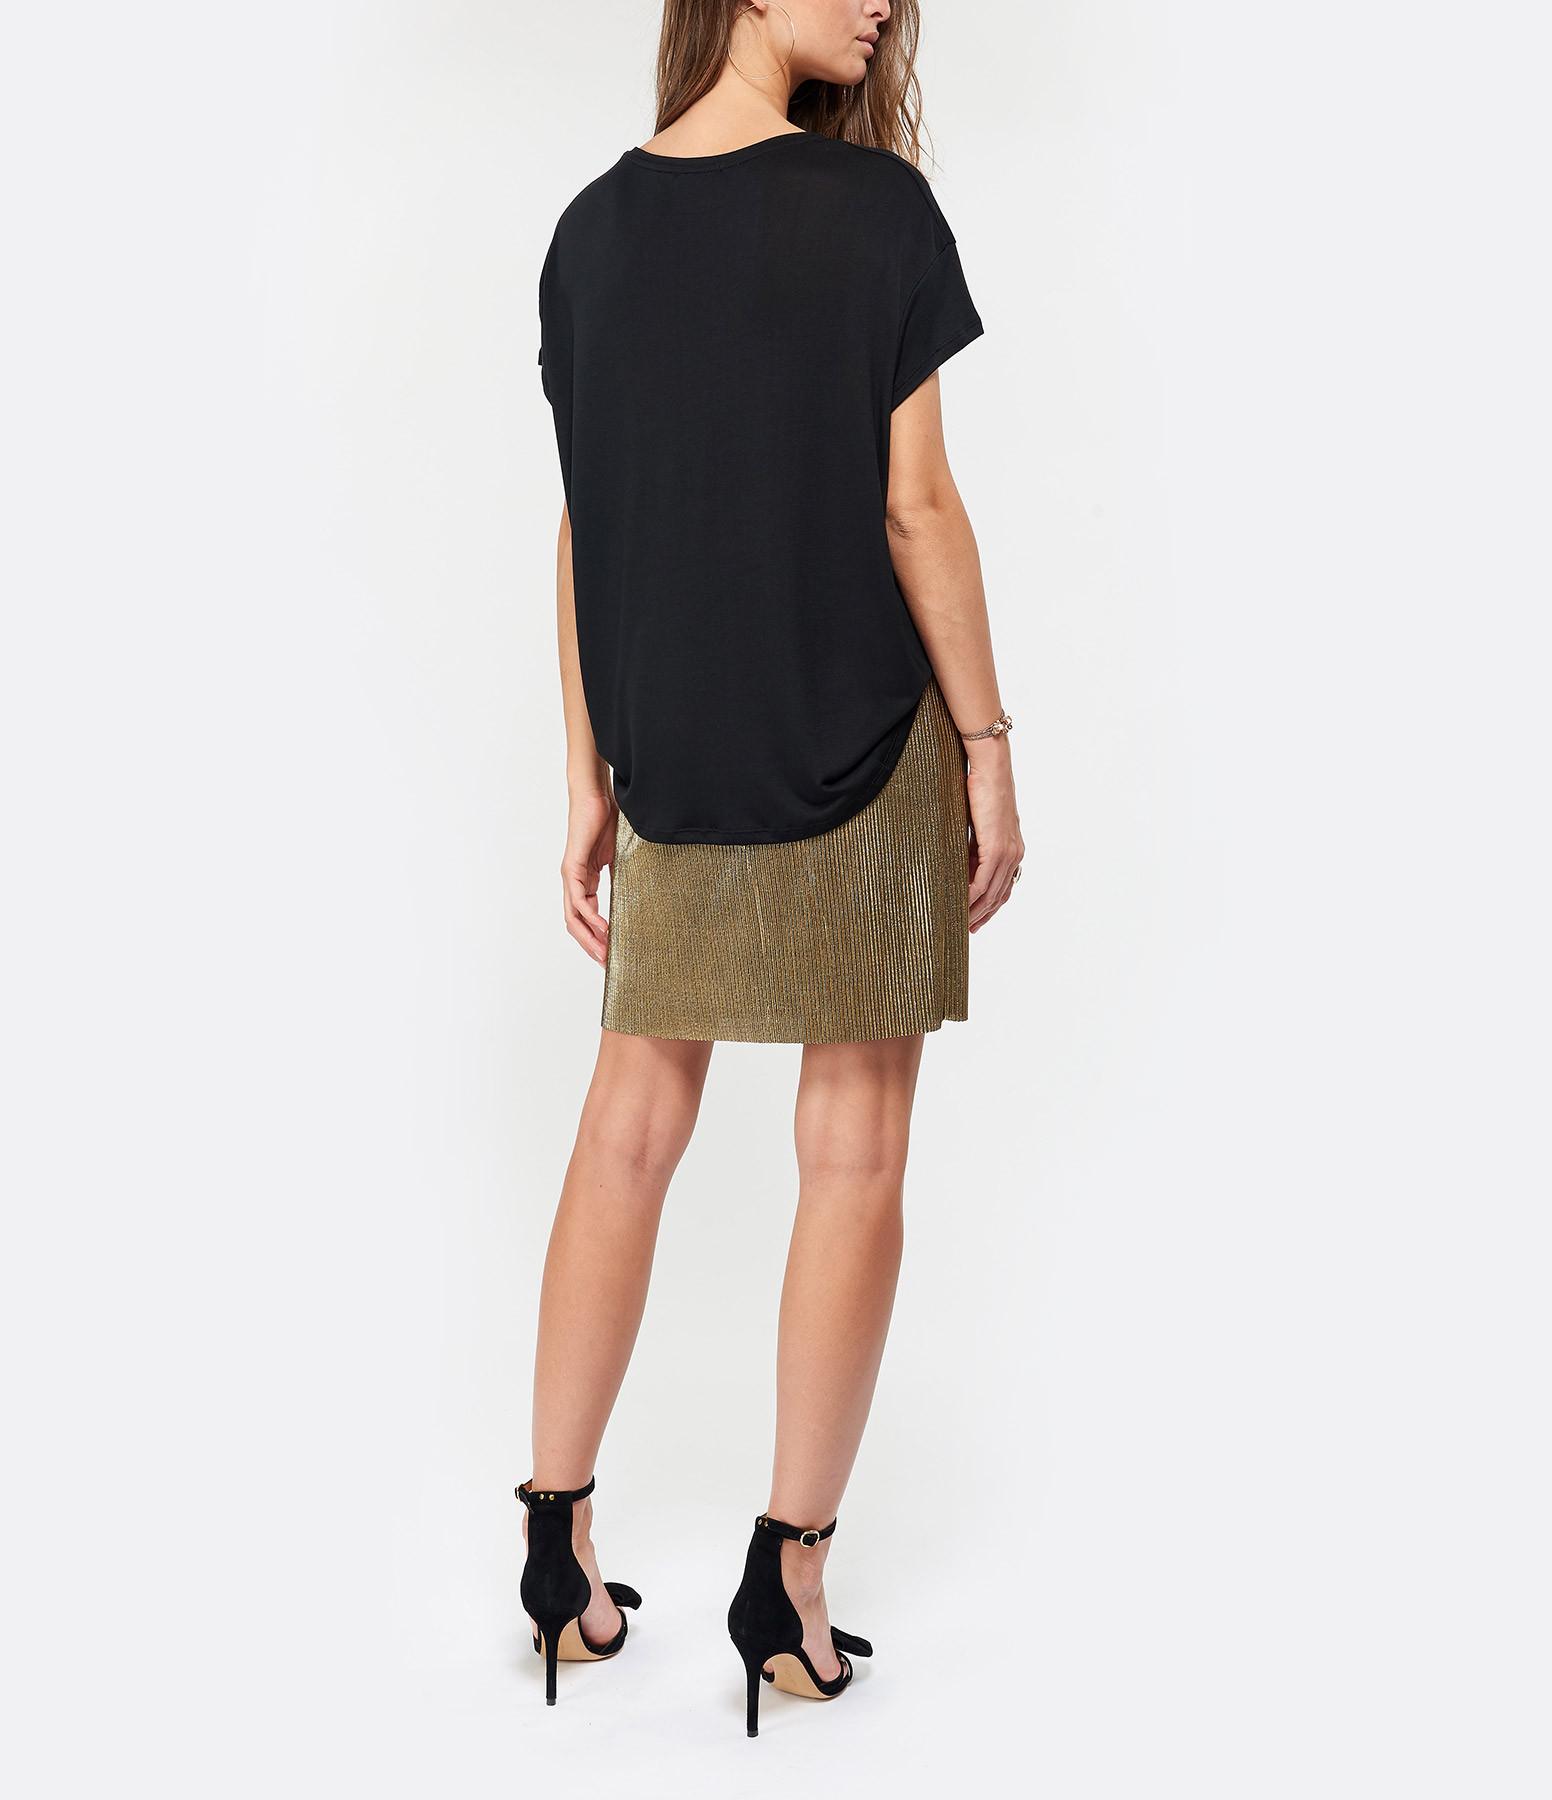 JEANNE VOULAND - Tee-shirt Bacha Lyocell Noir